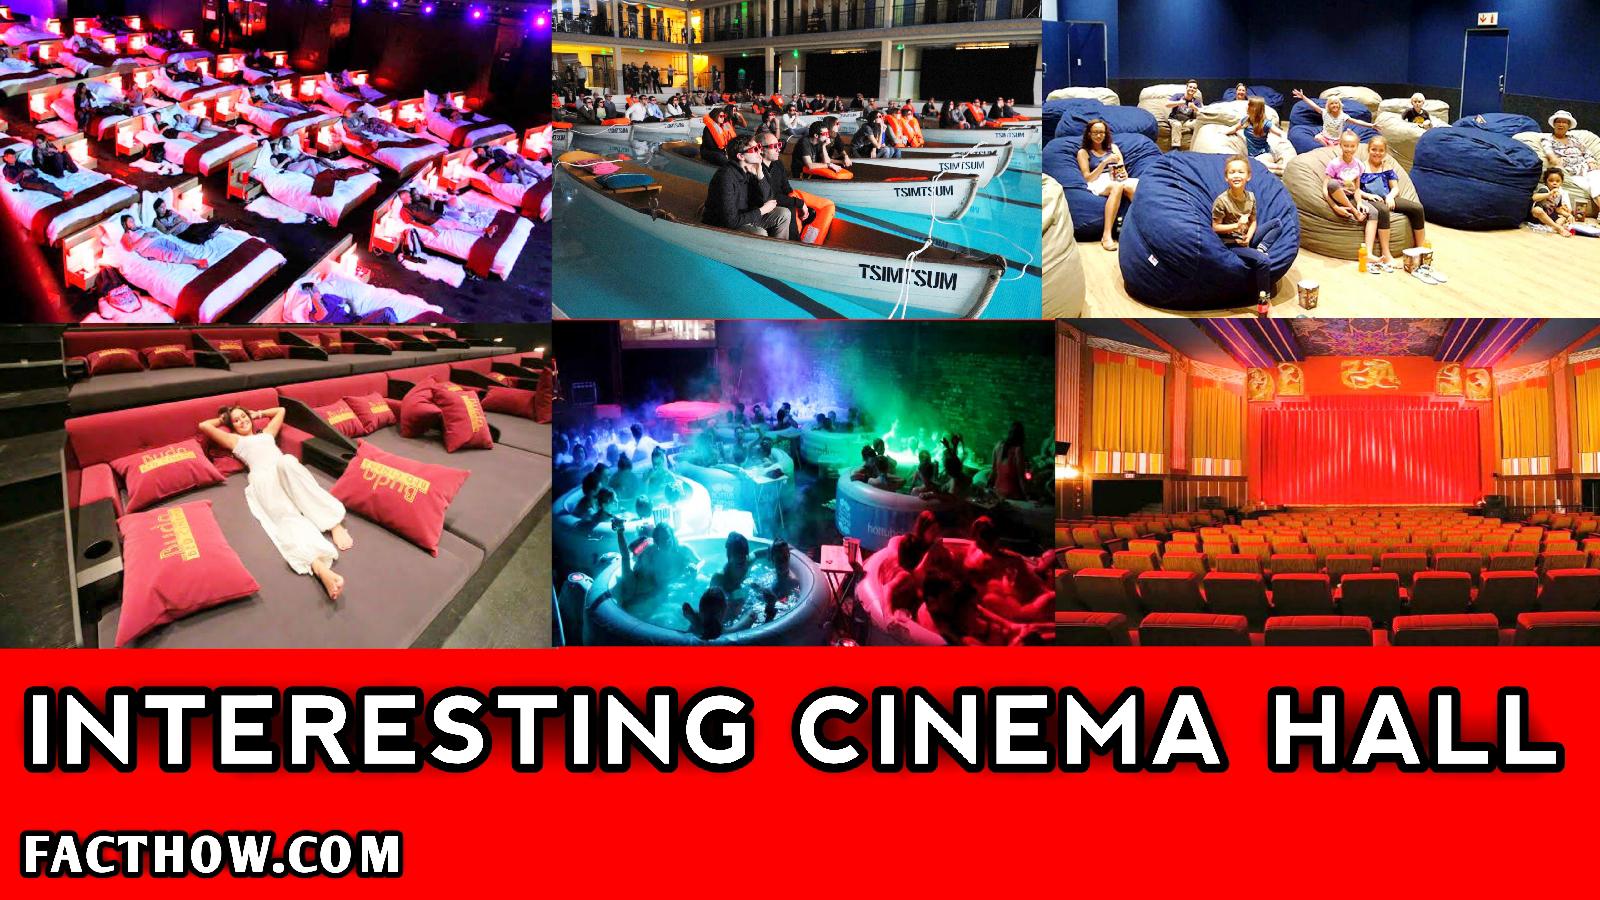 Cinema-movie-hall-theatre-interesting-amazing-unknown-facts-hindi-fact-how-facthow-amazing-cinemahall-world-luxurious-cinema-theatre-hall-hindi-movie-download-website-free-hindi-facts-rochak-tathya-hindi-jaankari-cinemaghar